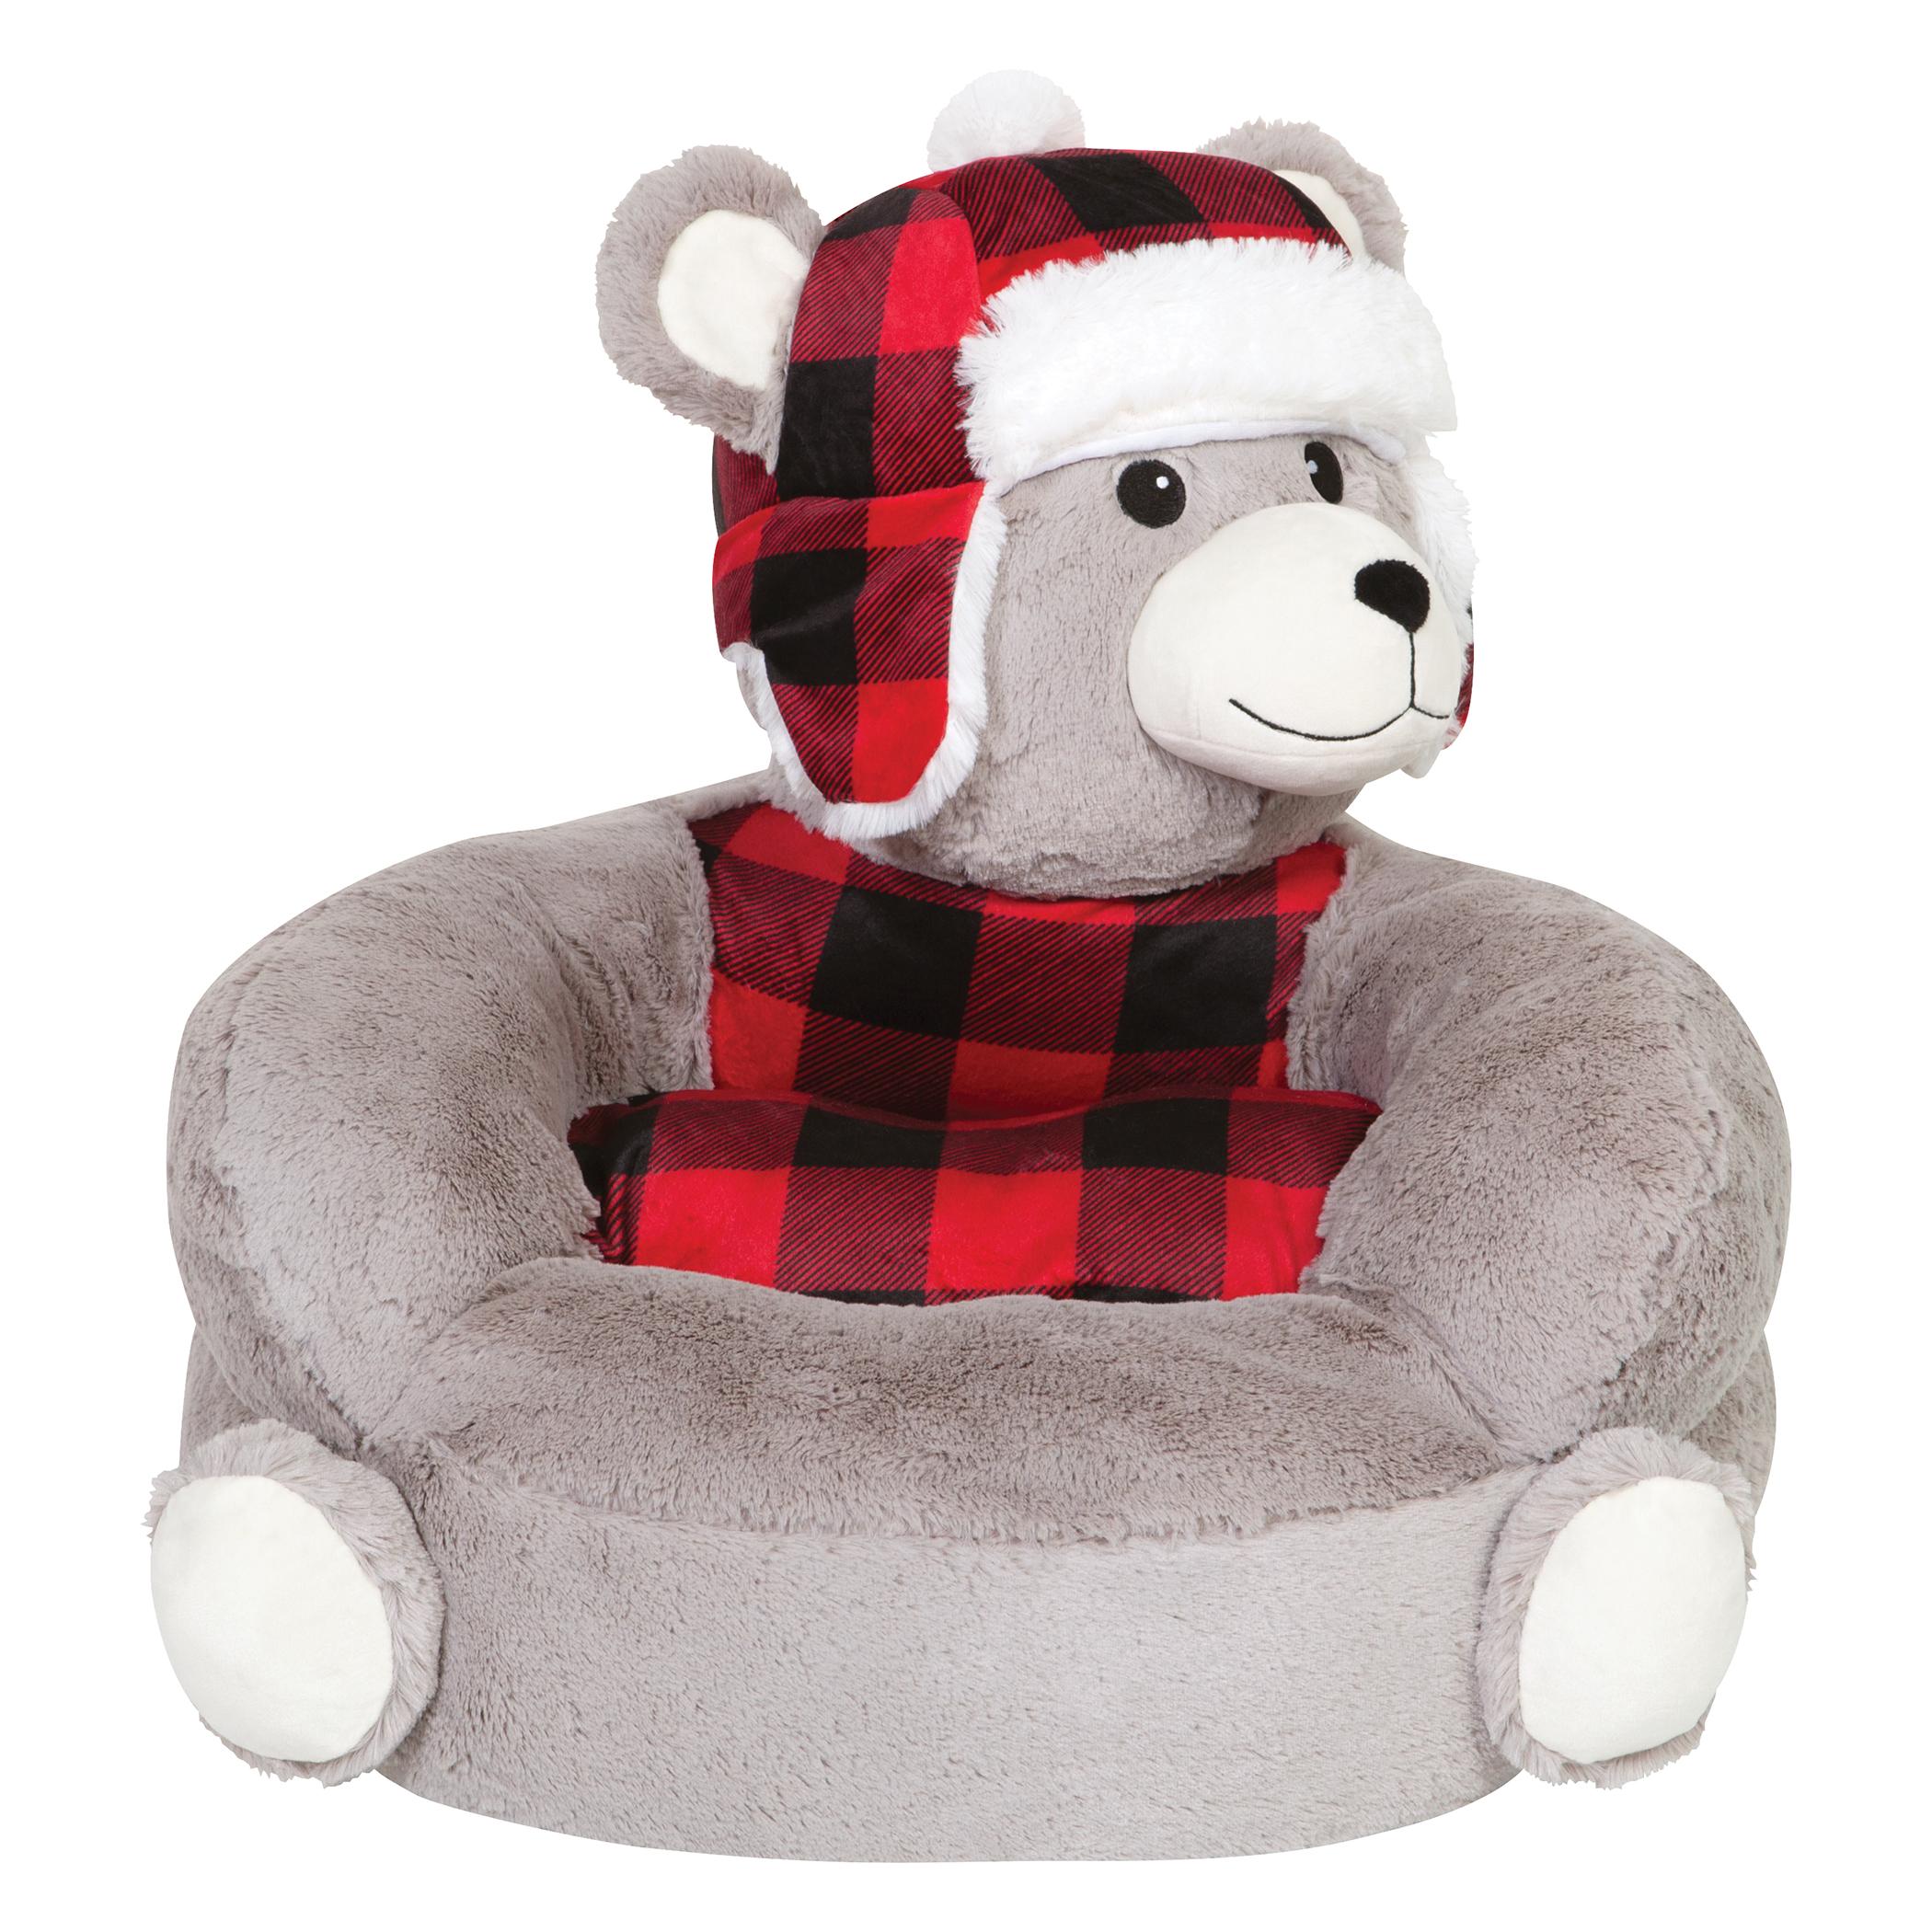 children s stuffed animal chairs pillowcase chair covers trend lab 39s plush buffalo check bear character